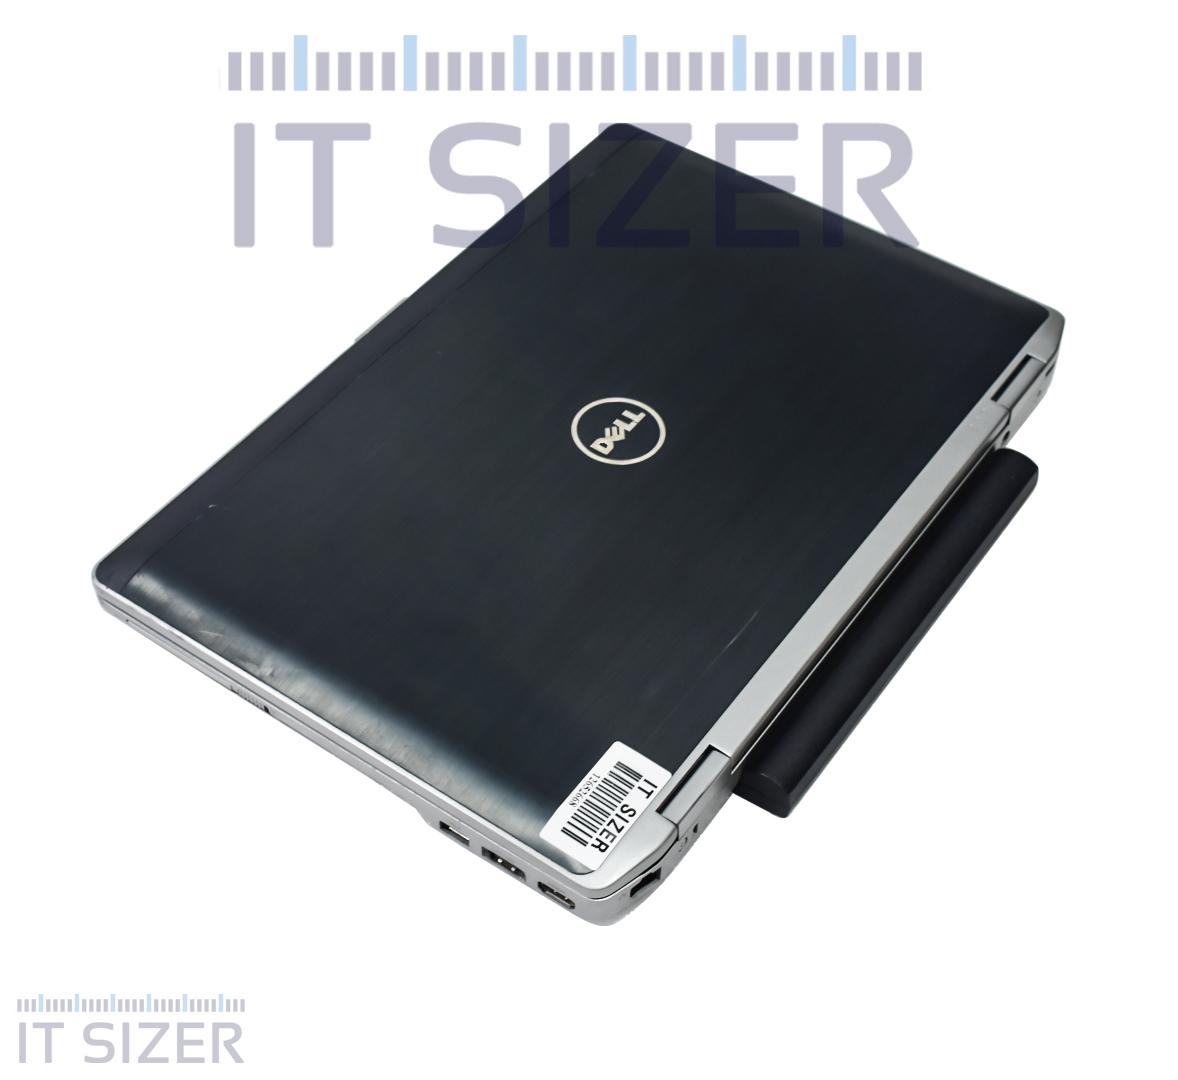 Dell Latitude E6530 Business Laptop, Intel Core i7 CPU, 8GB DDR3 SODIMM RAM, 500GB SATA 2.5 Hard, 15 inch Display, Windows 10 Pro (Renewed)